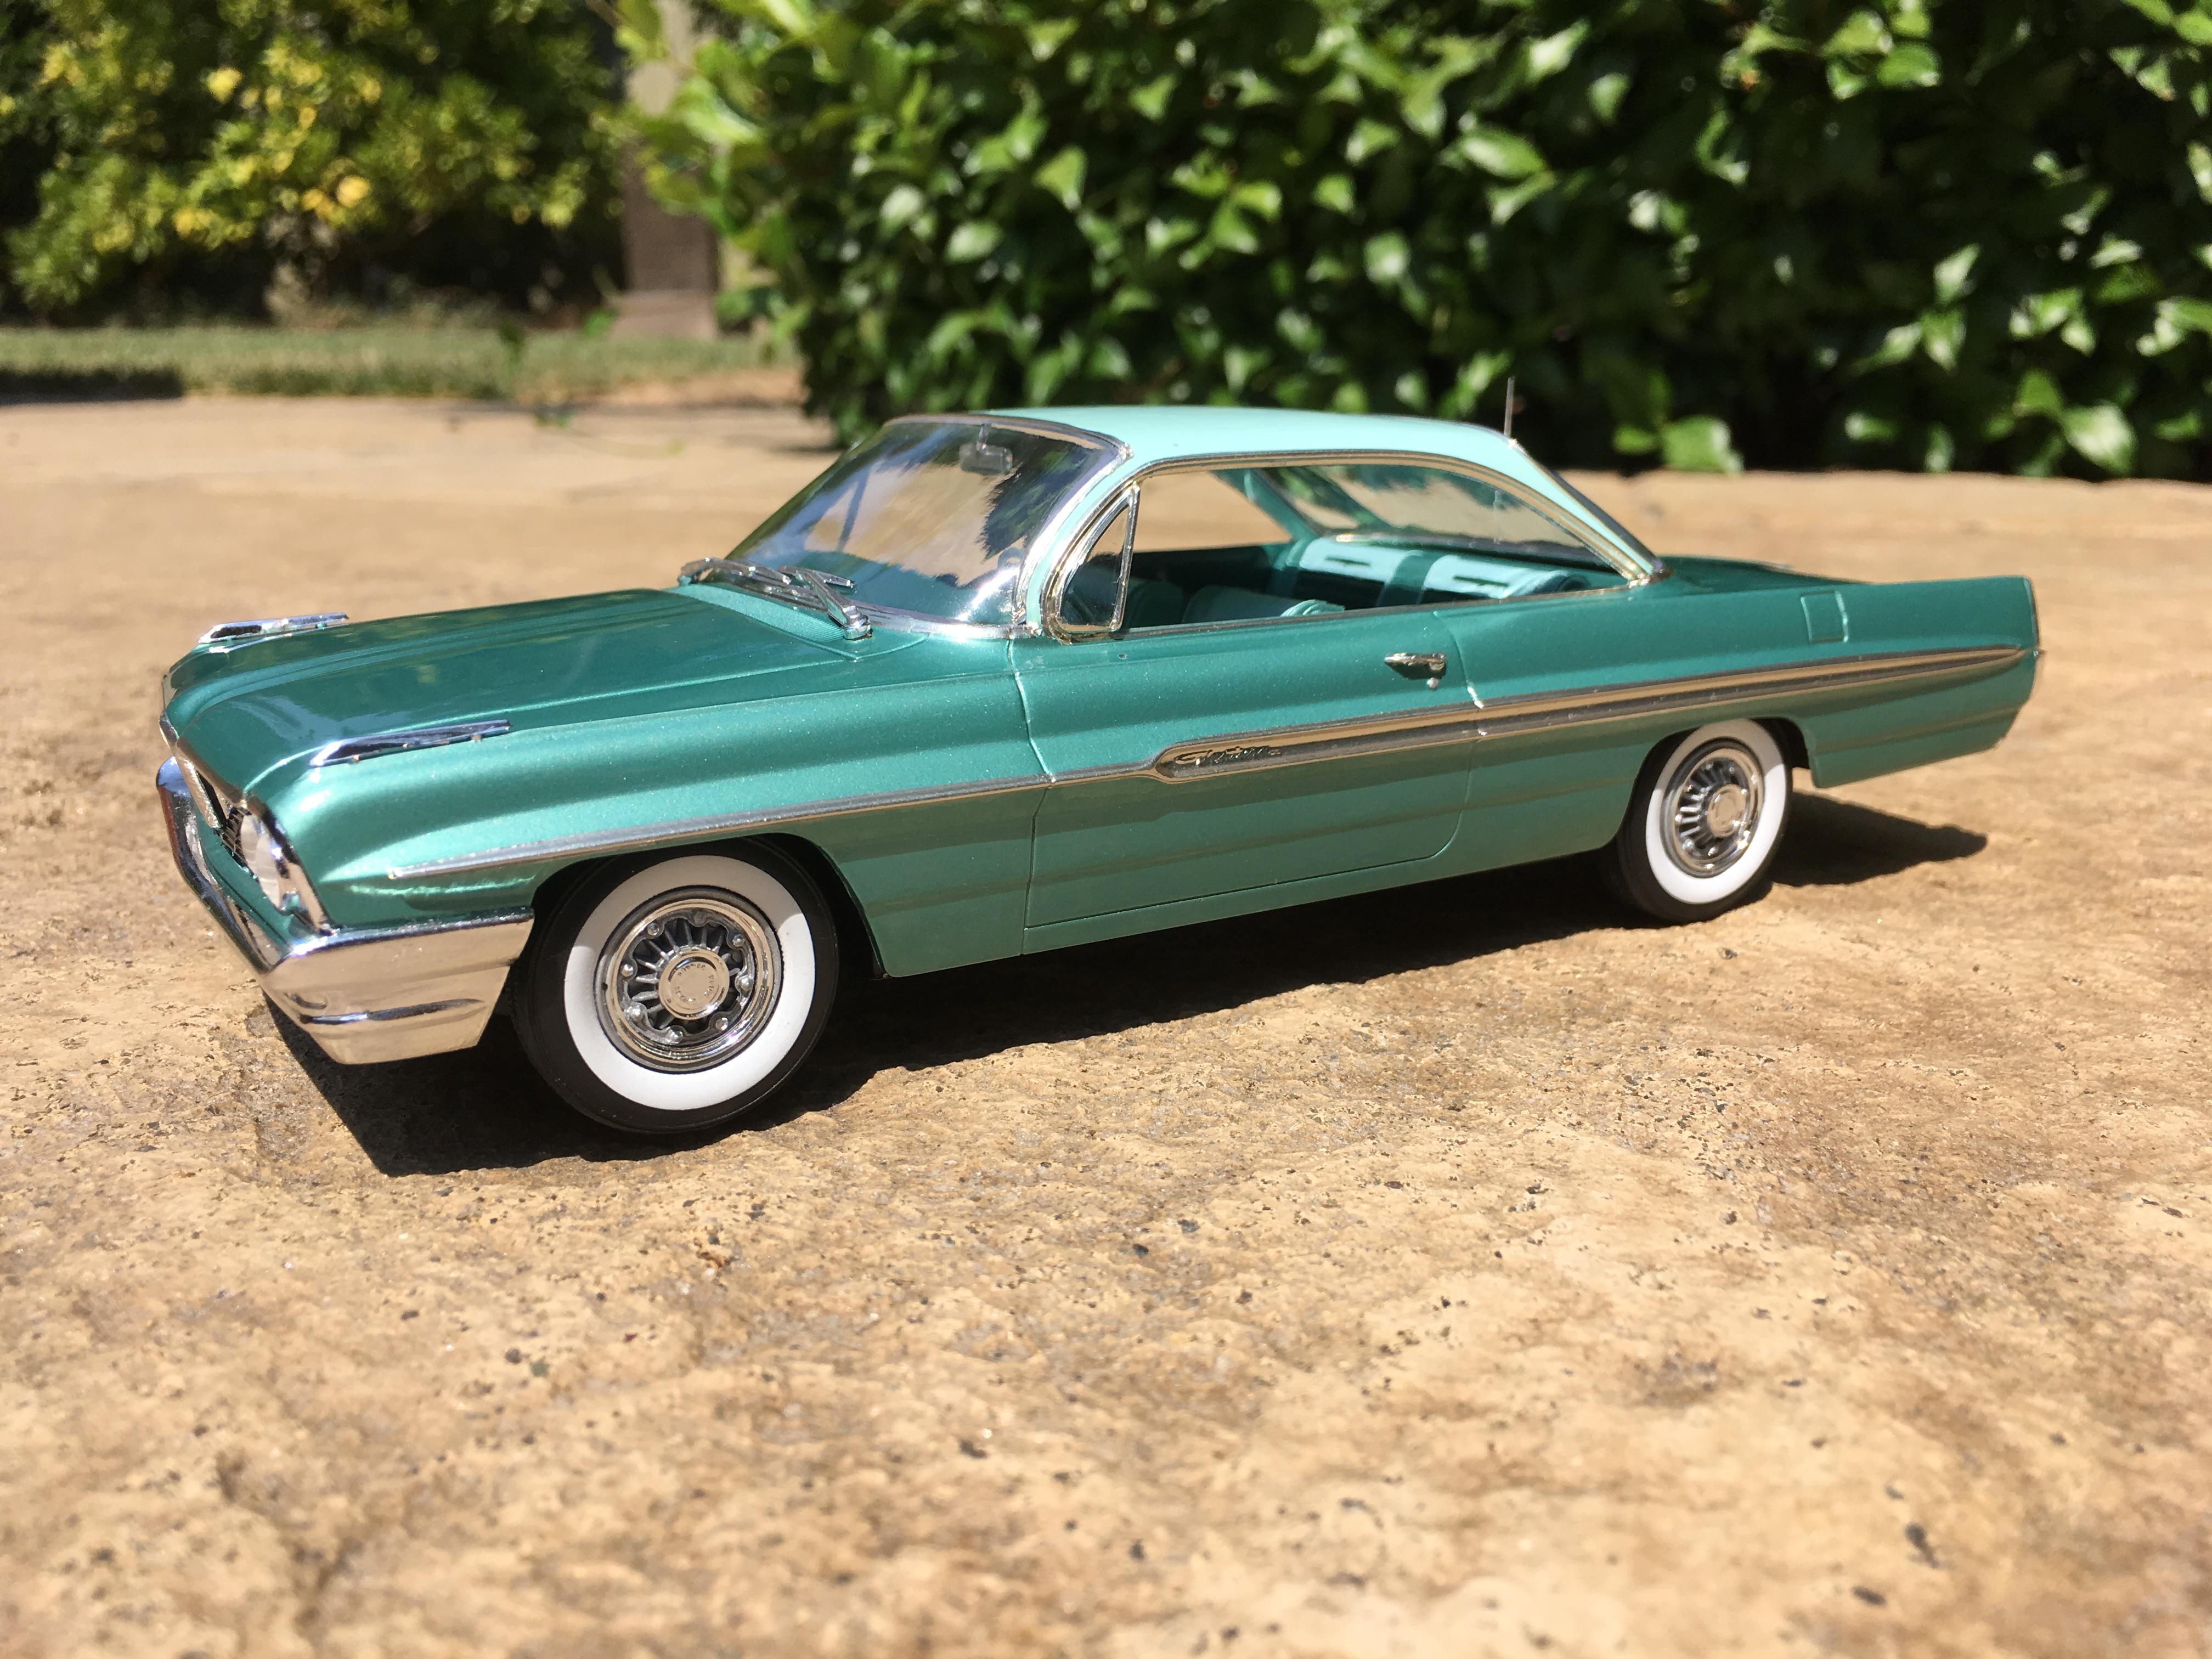 1961 Pontiac Catalina Ventura - Under Glass - Model Cars